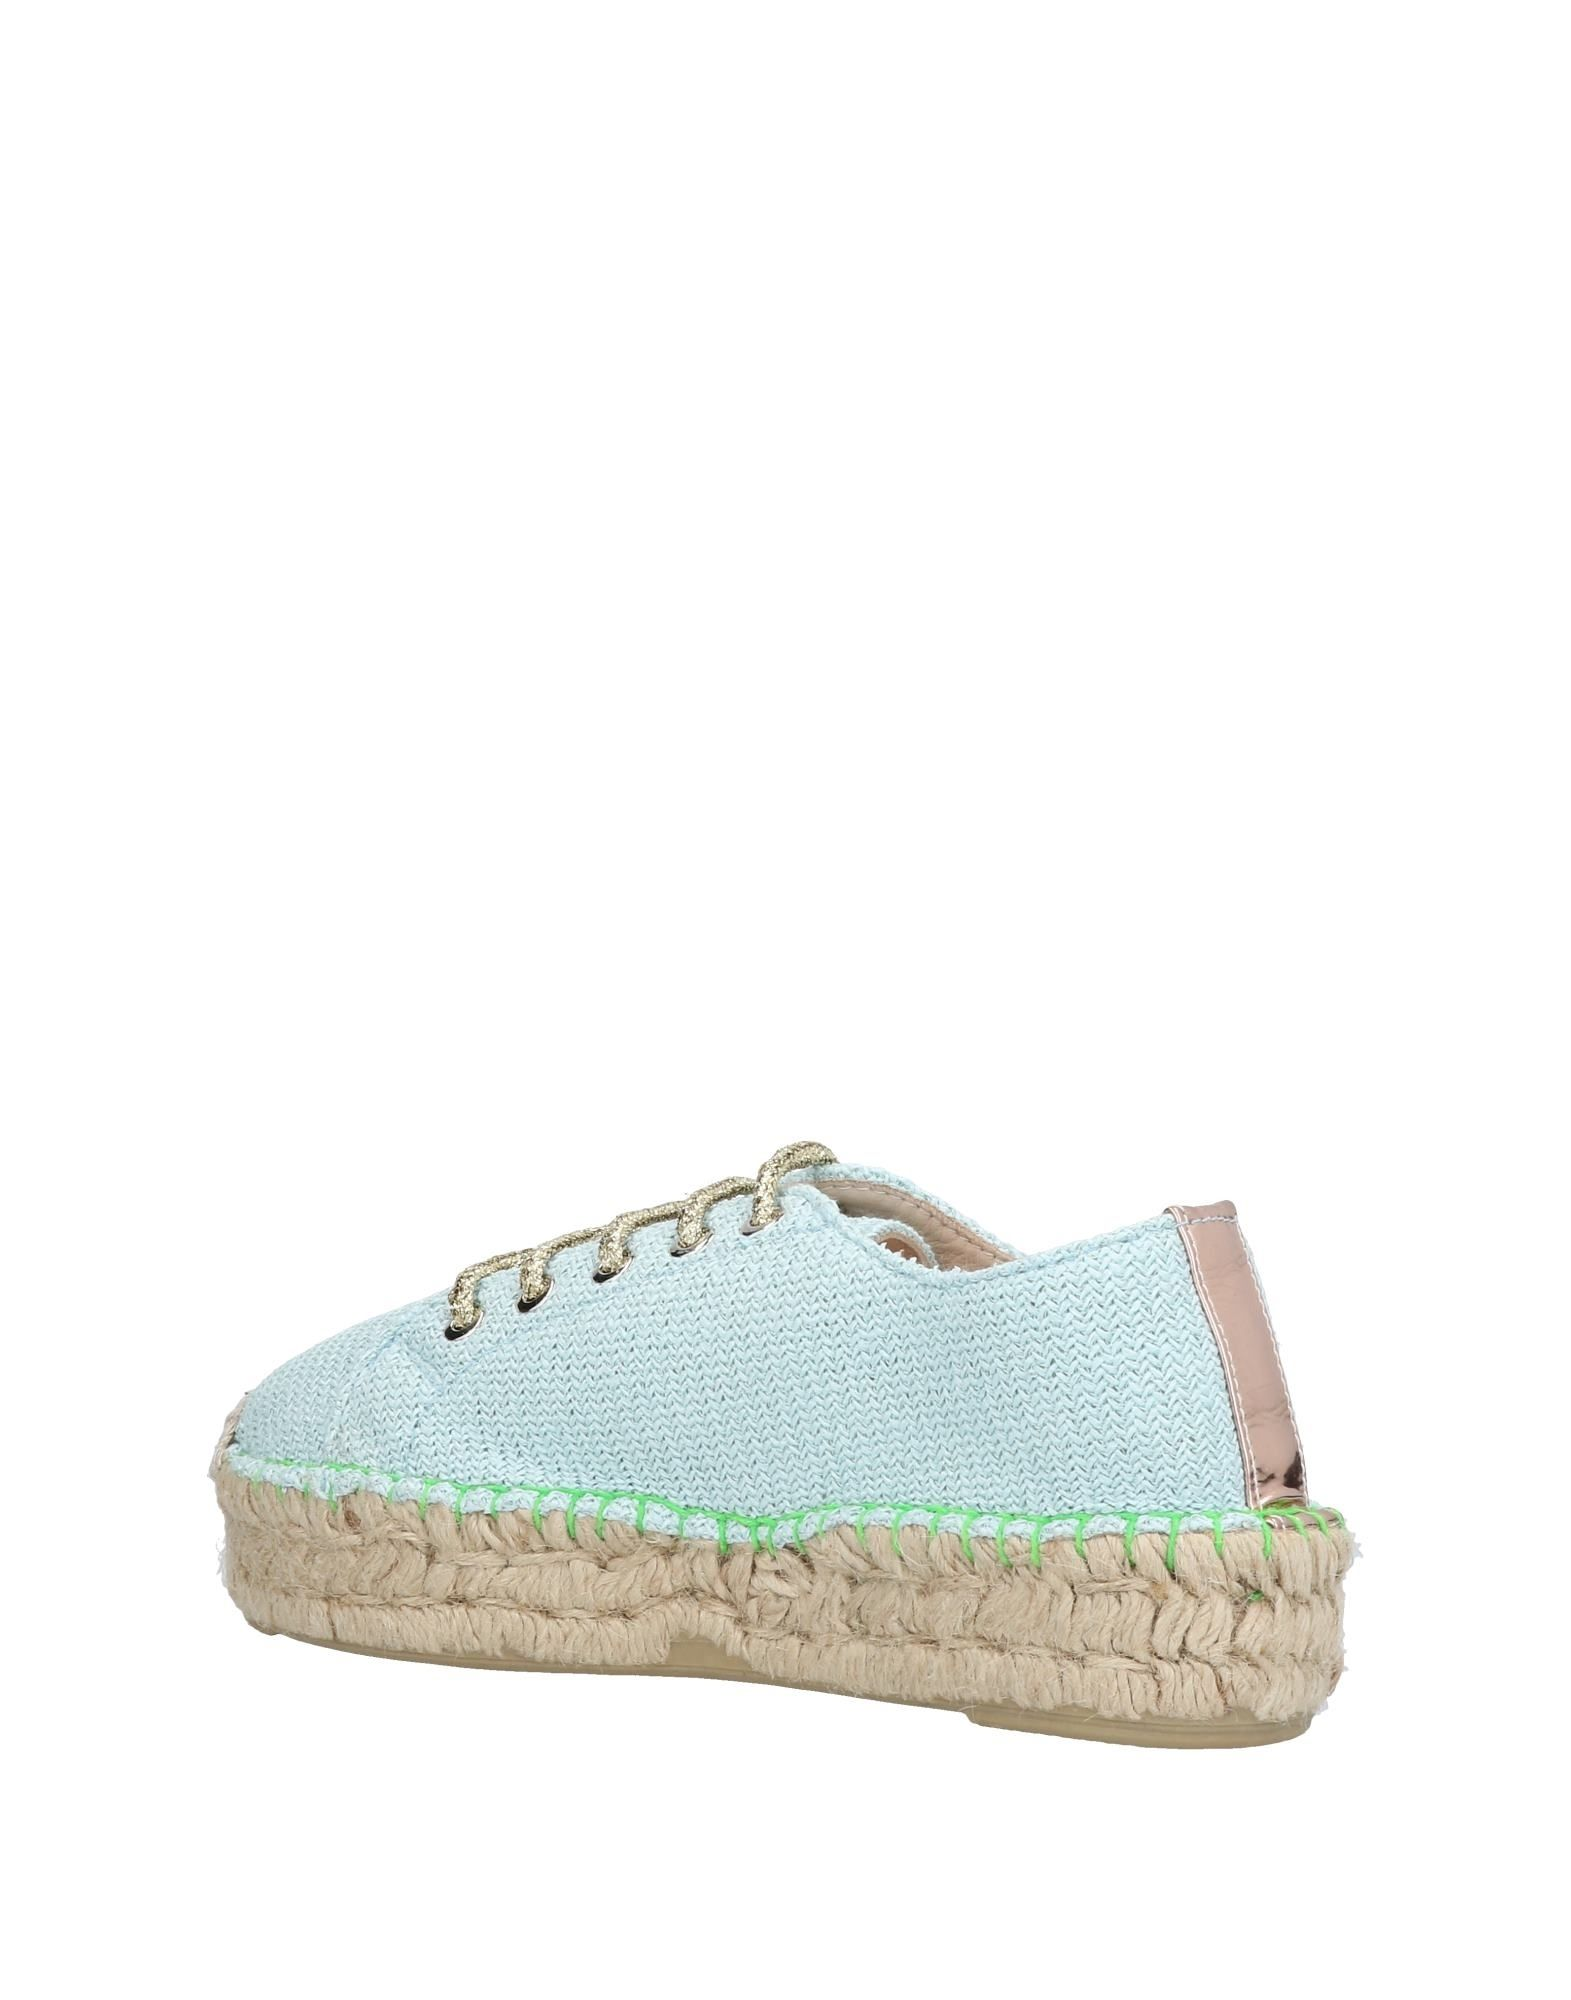 Leo 11442749GX Studio Design Sneakers Damen  11442749GX Leo Gute Qualität beliebte Schuhe 56a2ac